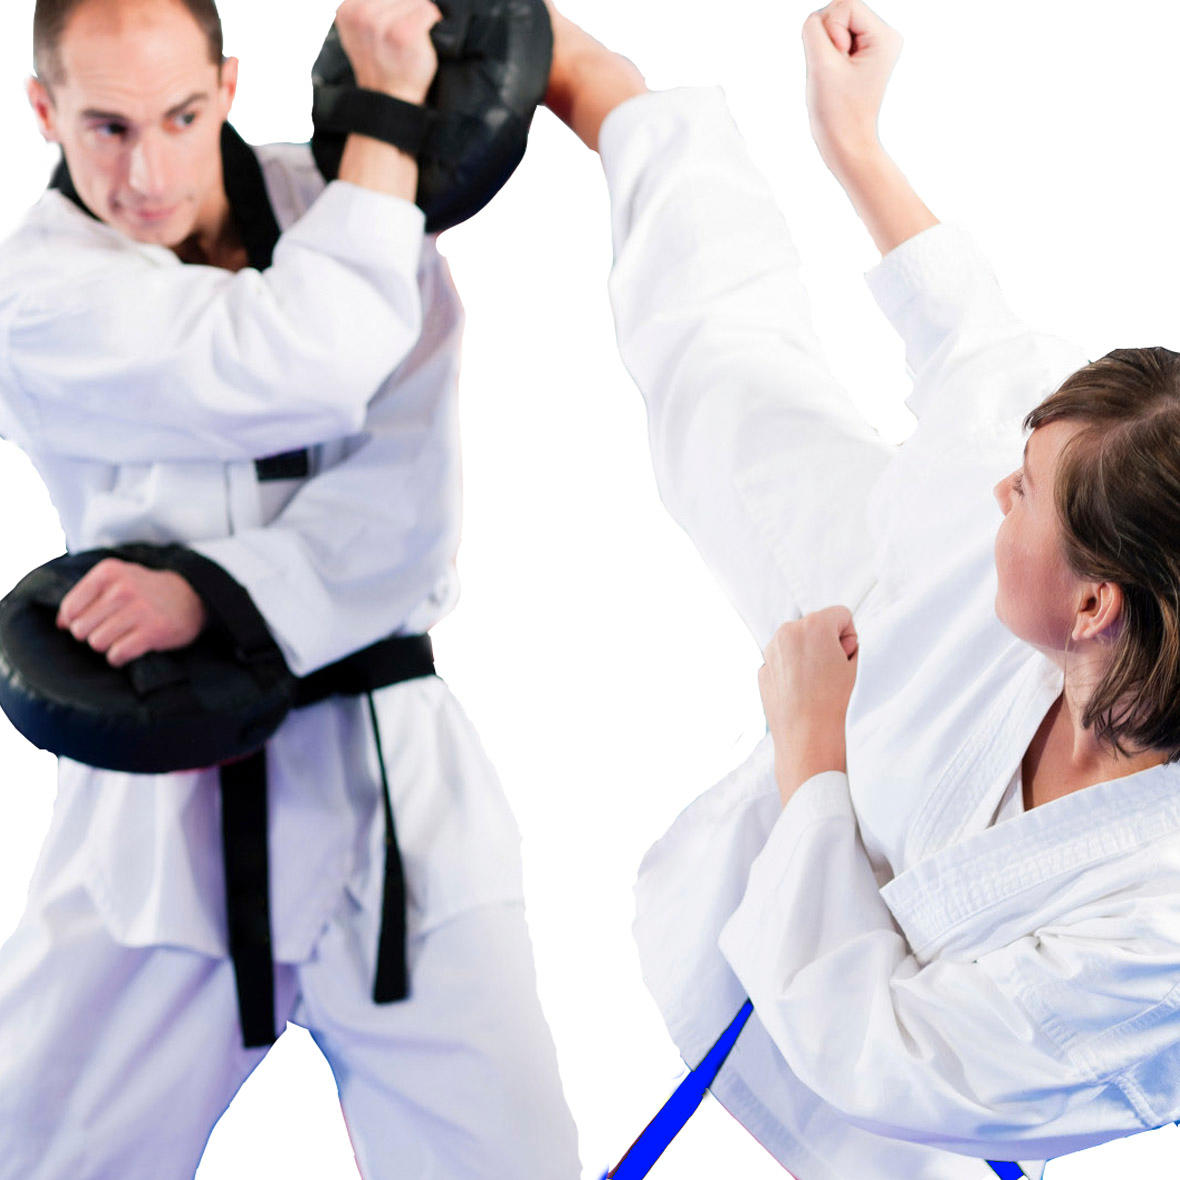 Millennium Martial Arts - Tae Kwon Do image 0